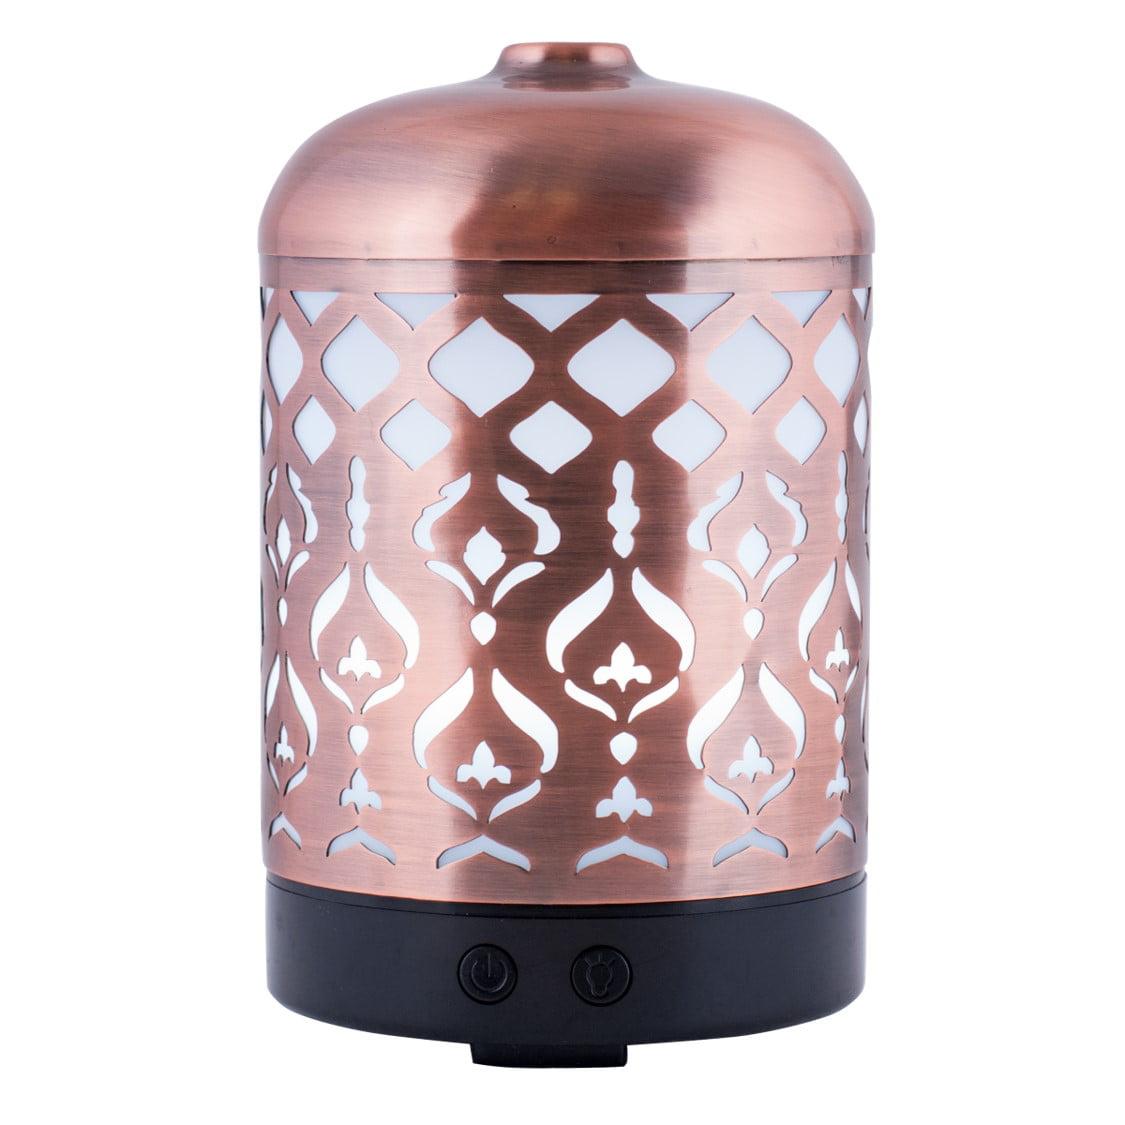 Better Homes and Gardens 250 mL Cool Mist Ultrasonic Aroma Diffuser, Tabriz